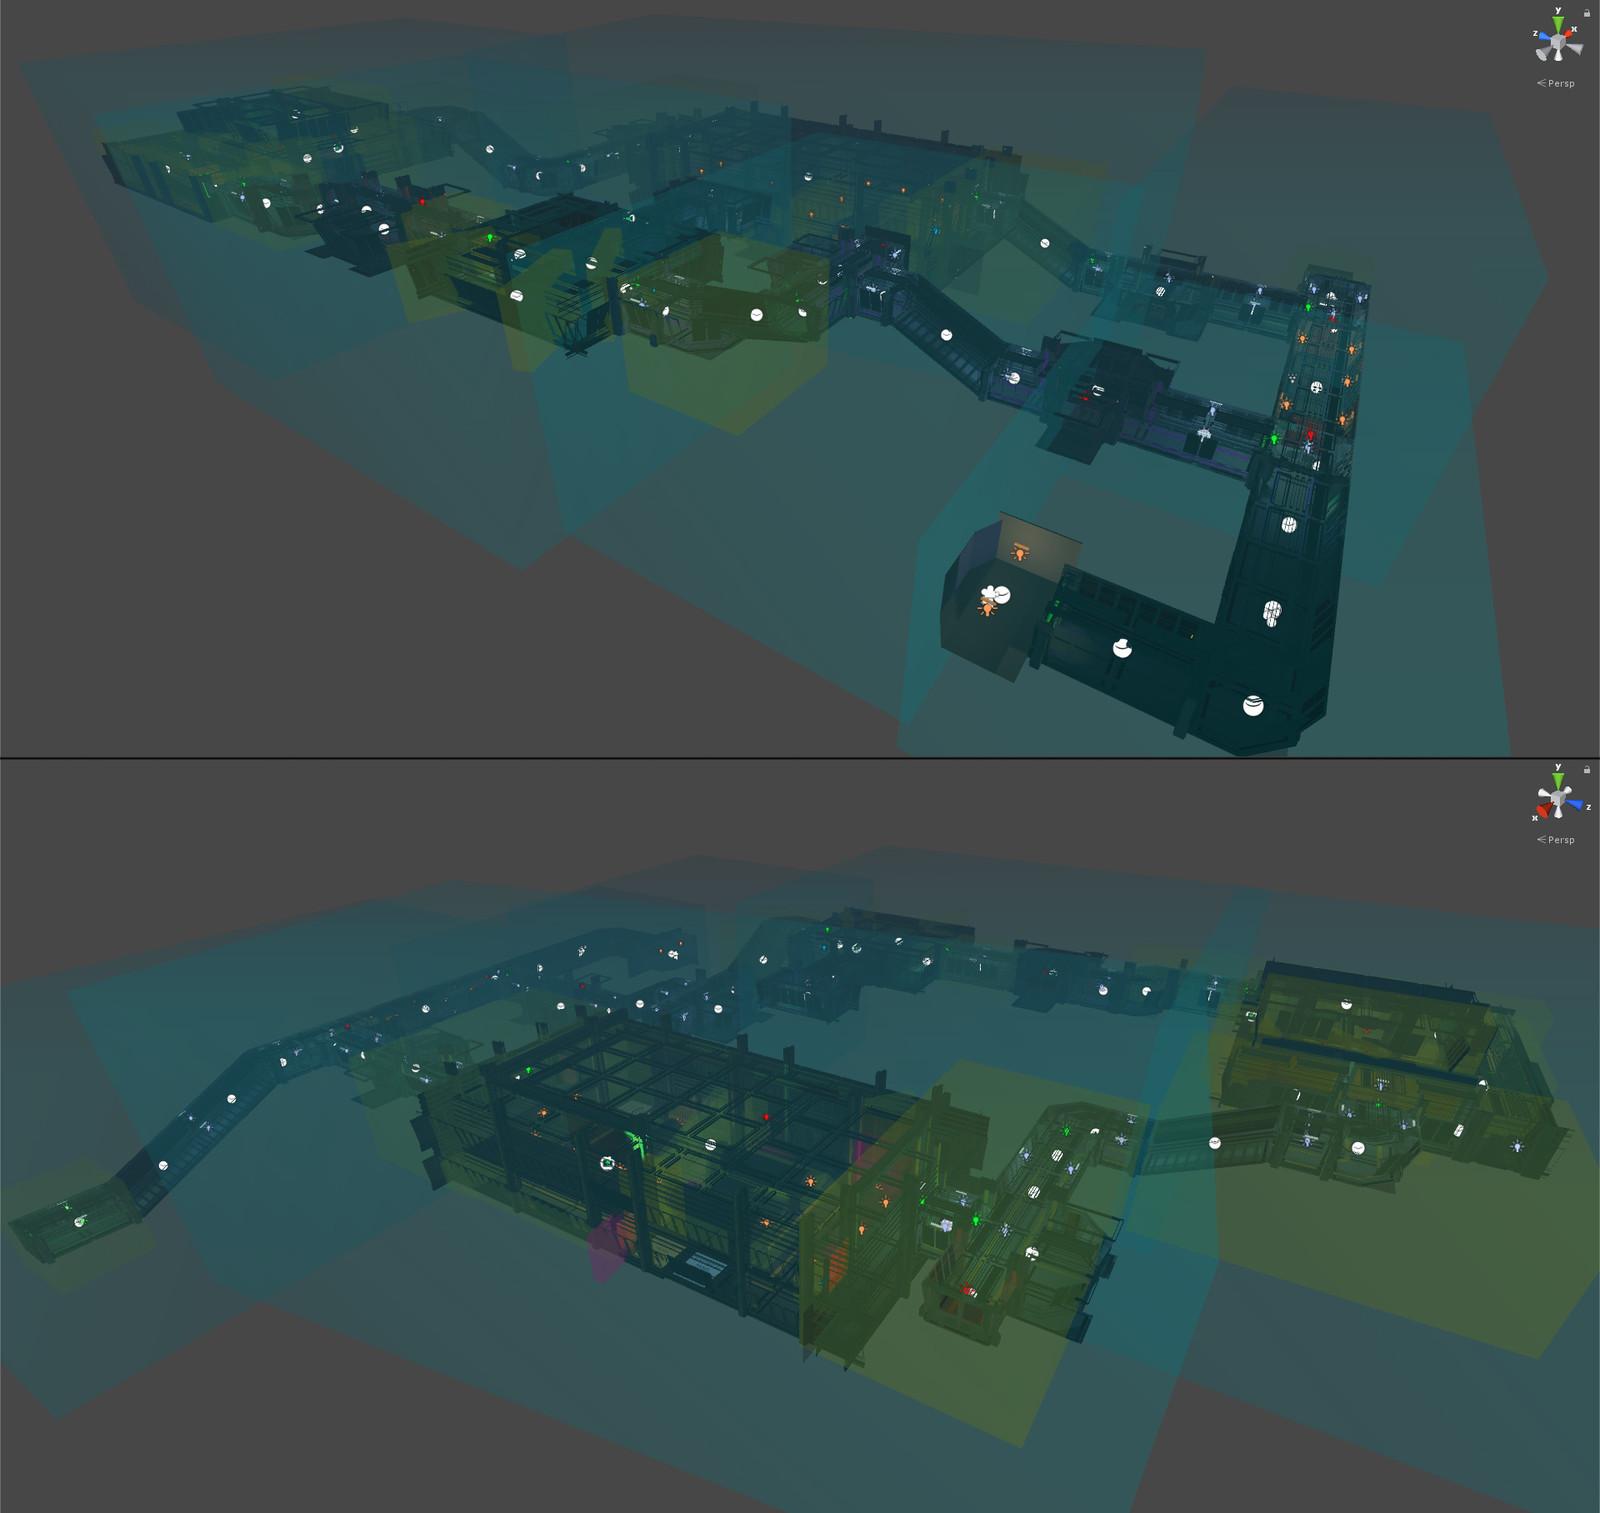 Level Editor screenshots